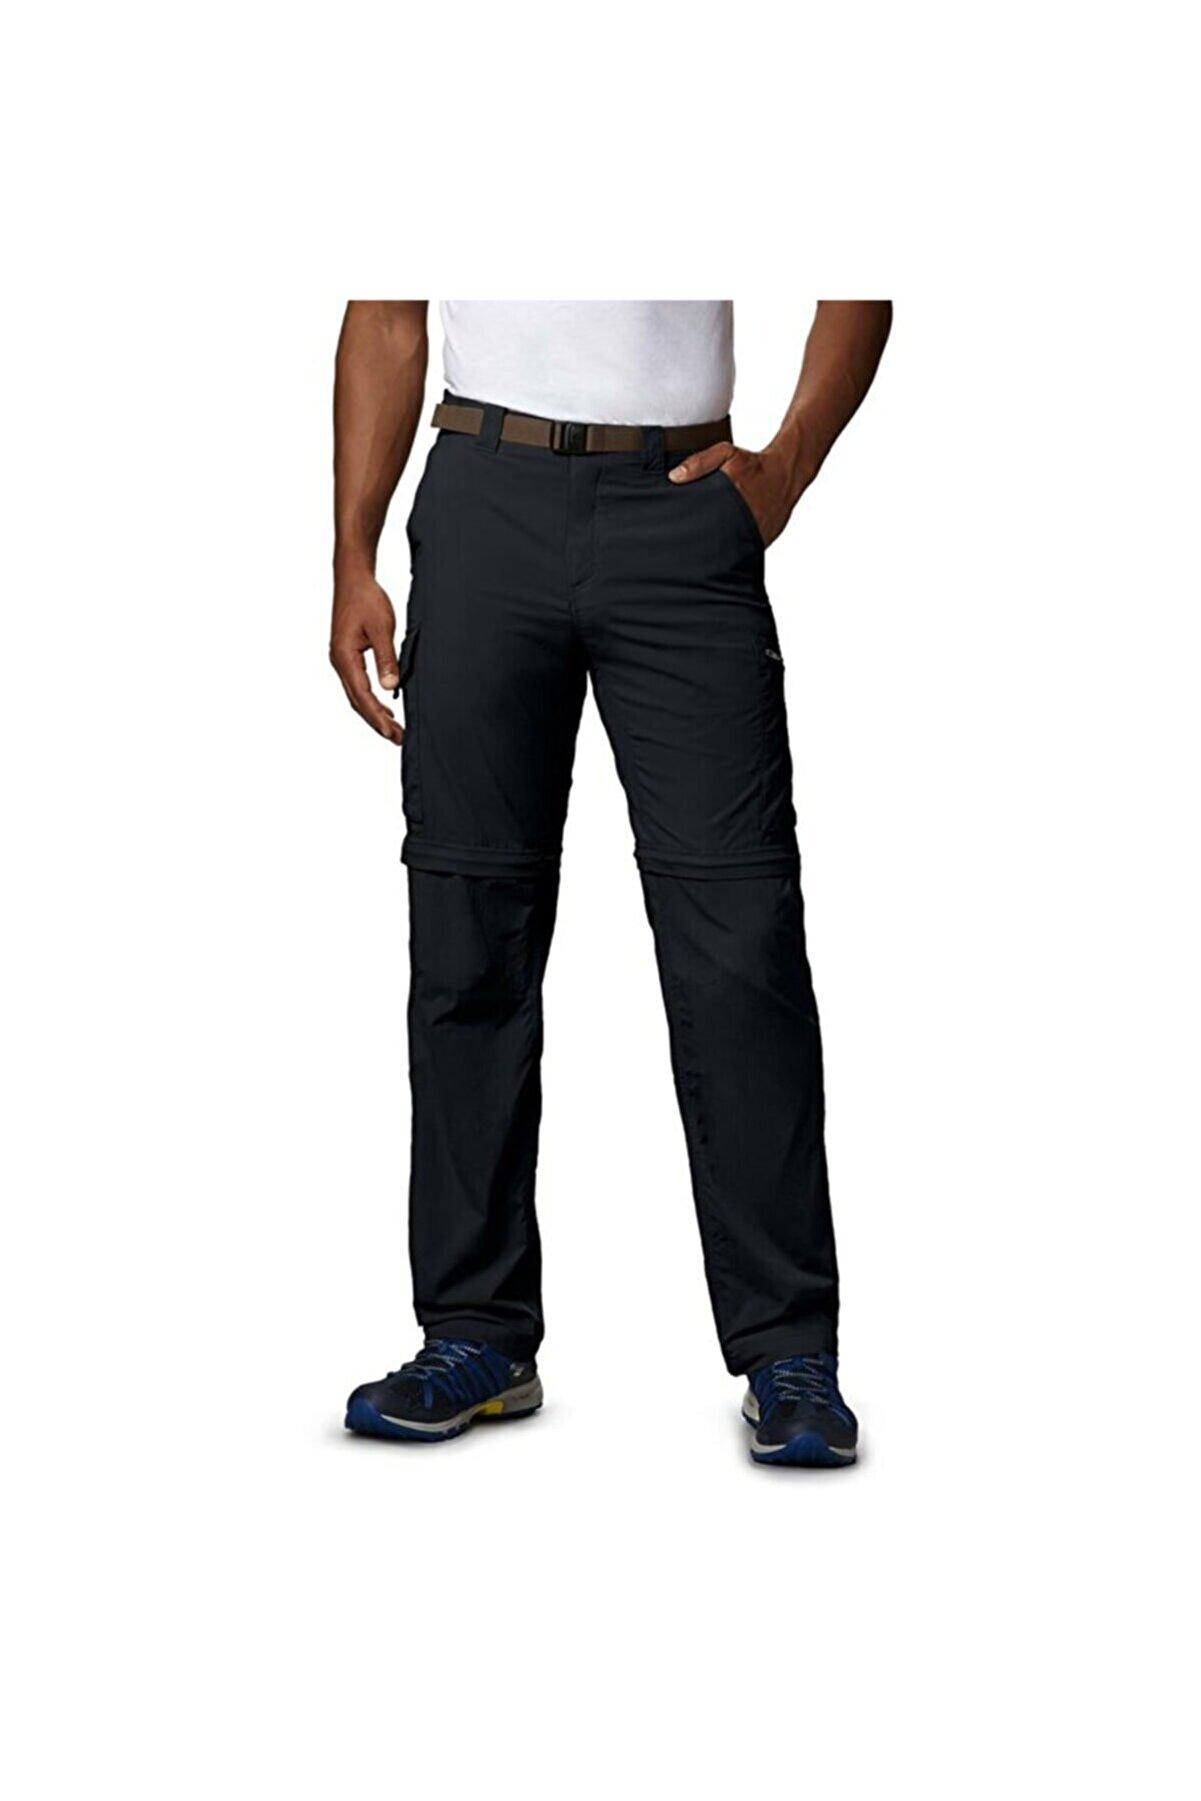 Columbia Silver Ridge Convertible Pant Erkek Siyah Outdoor Pantolon Am8004-010